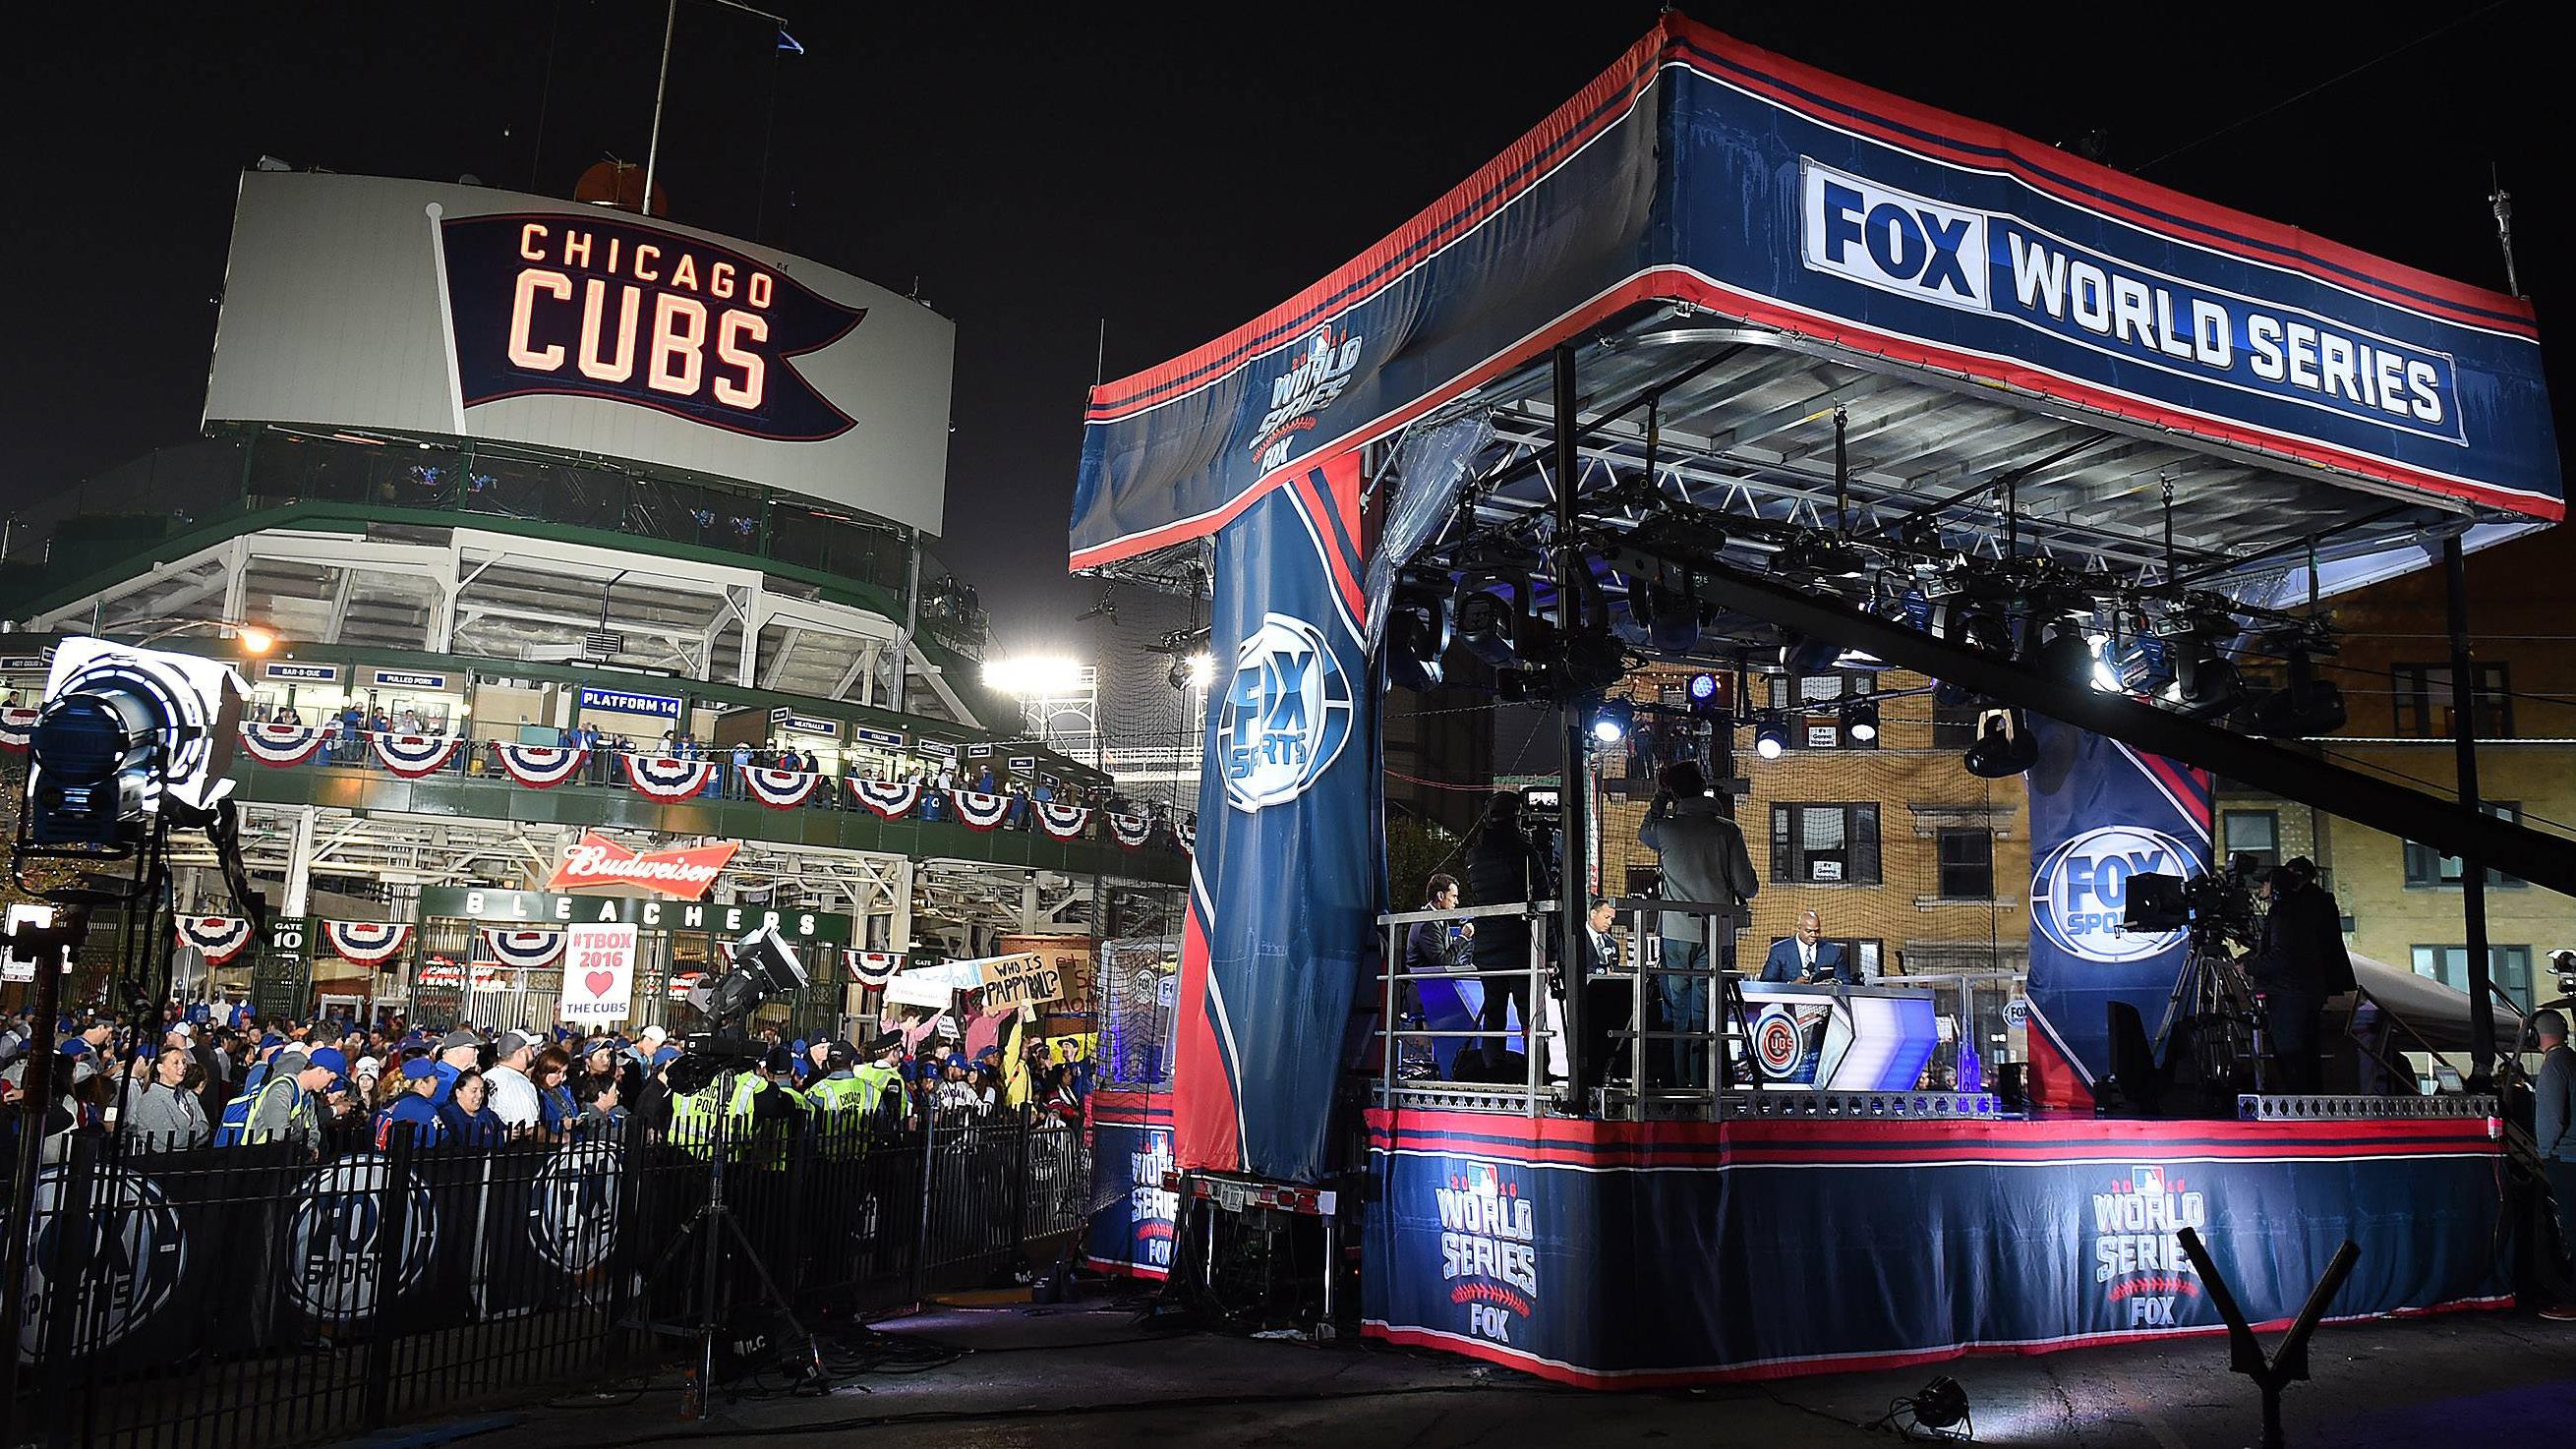 2016 World Series Wrigley Field Set